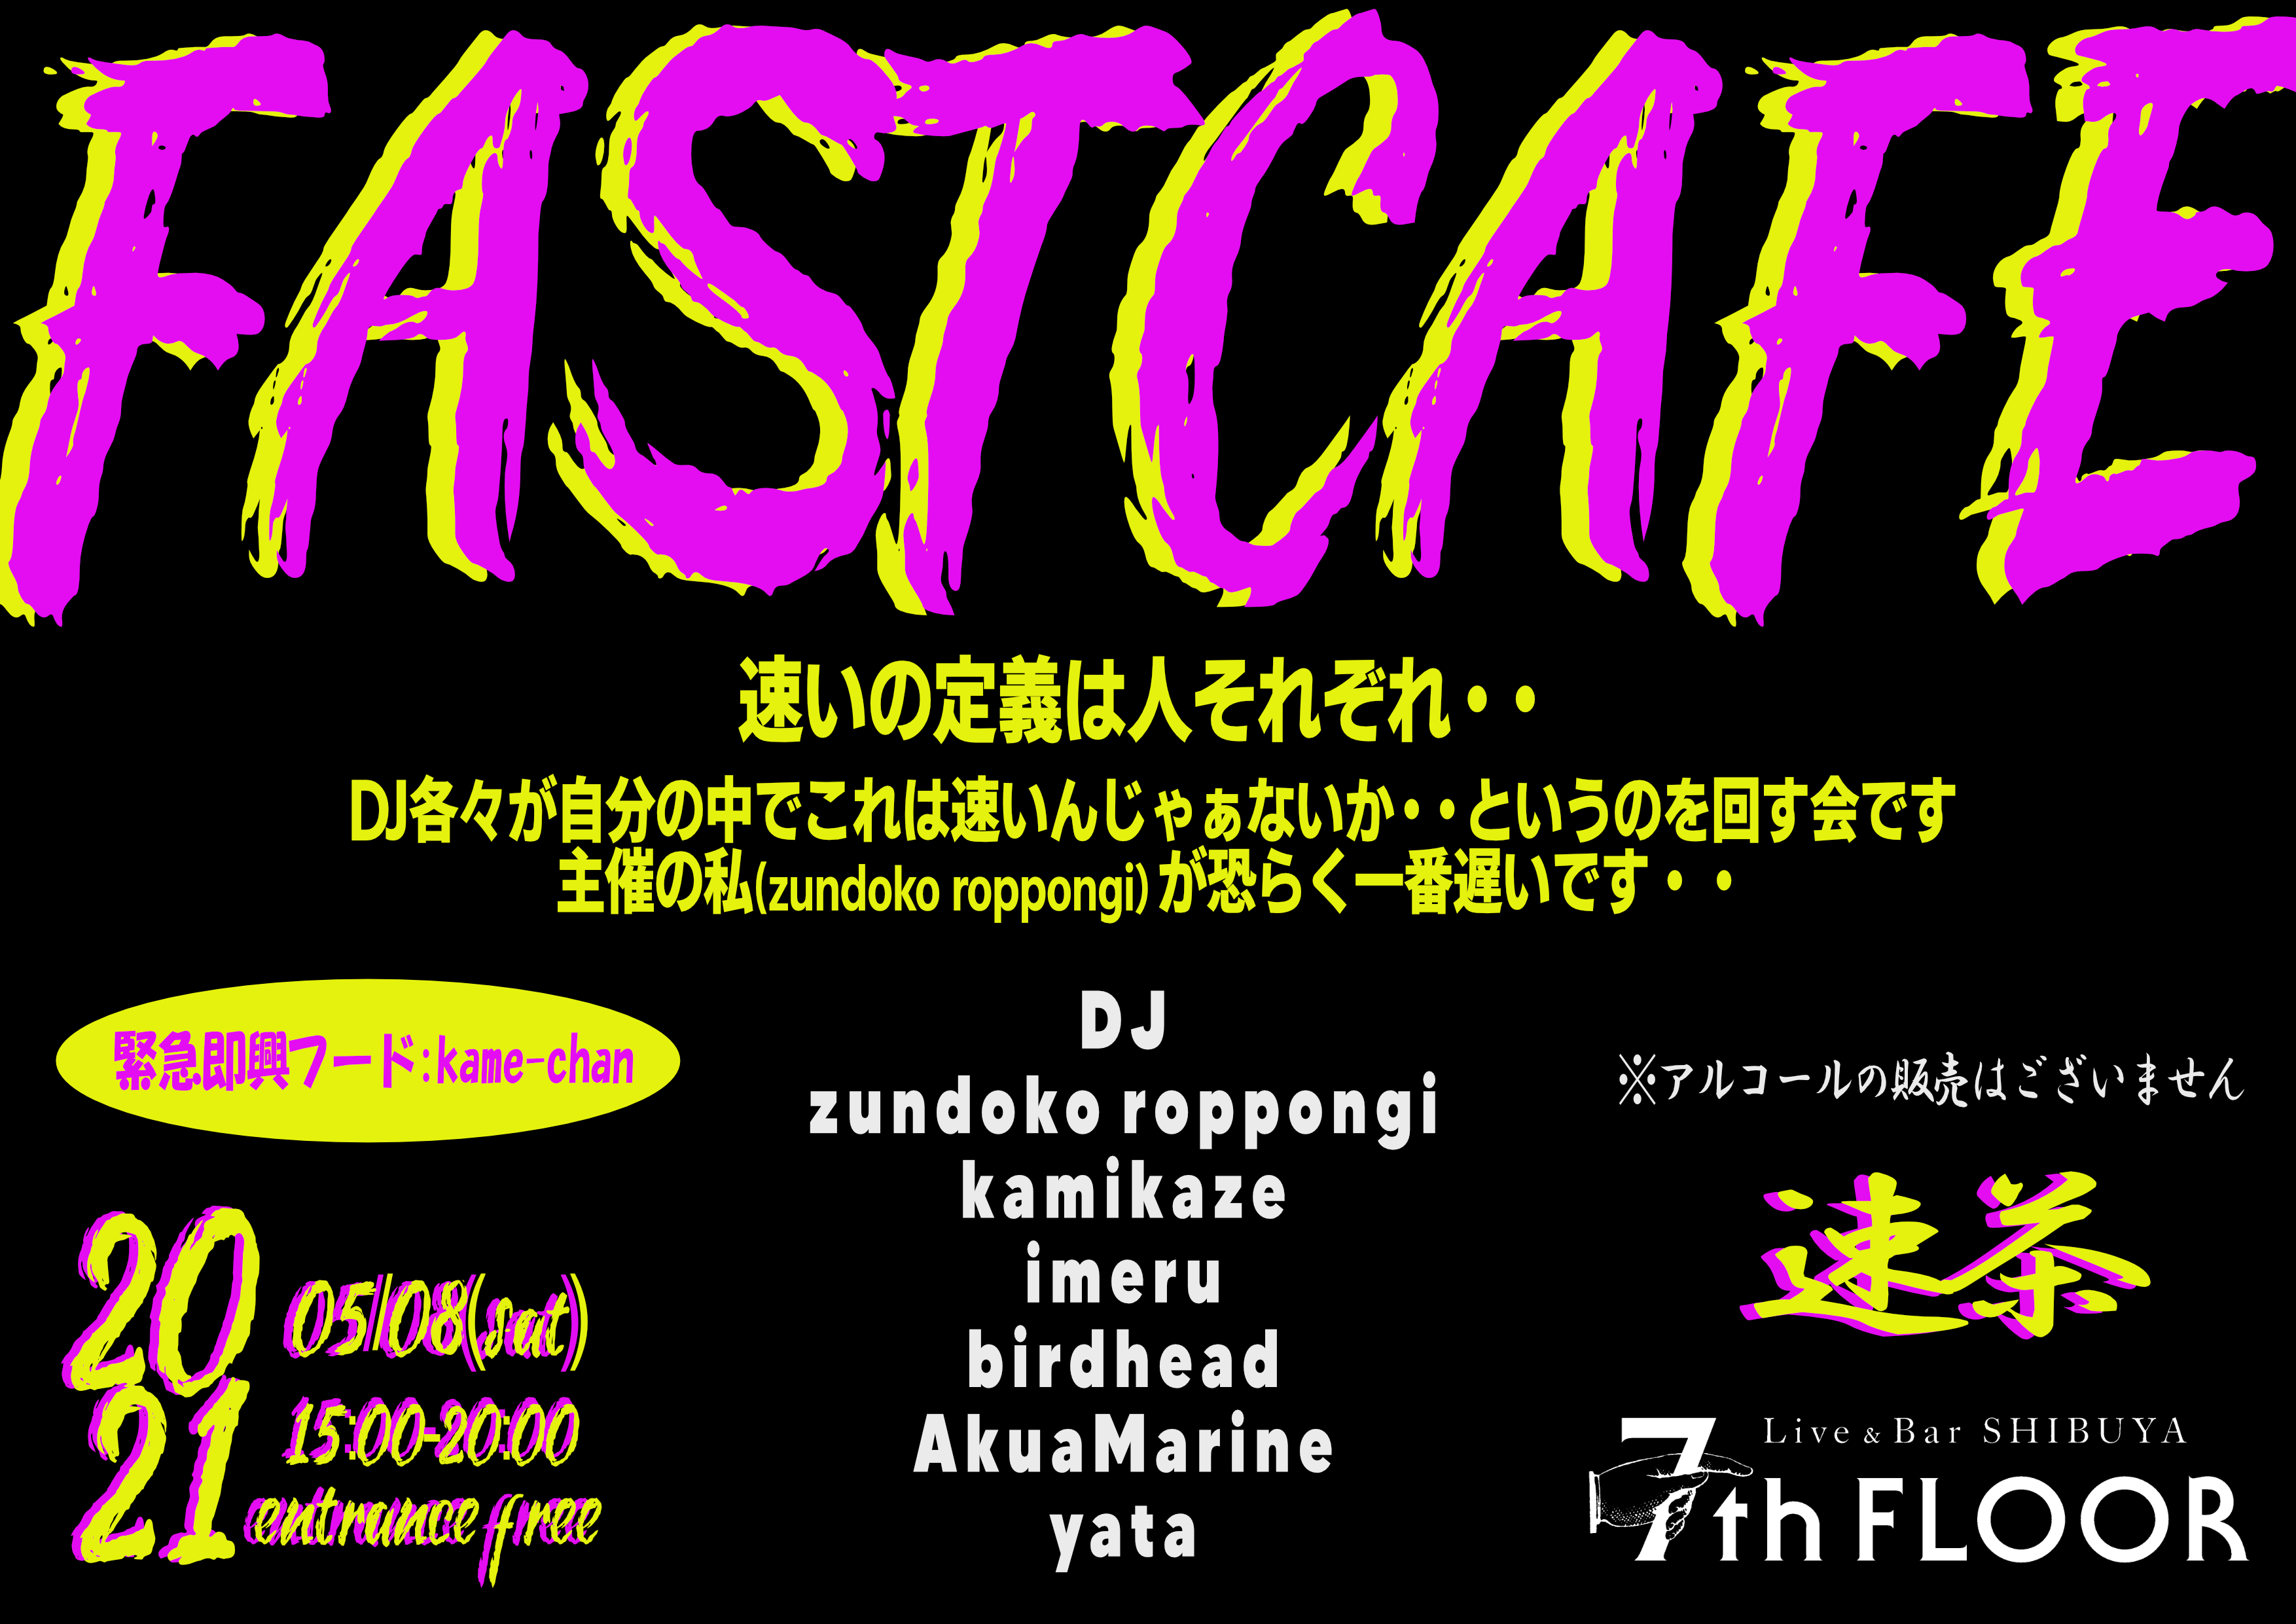 FASTCAFE